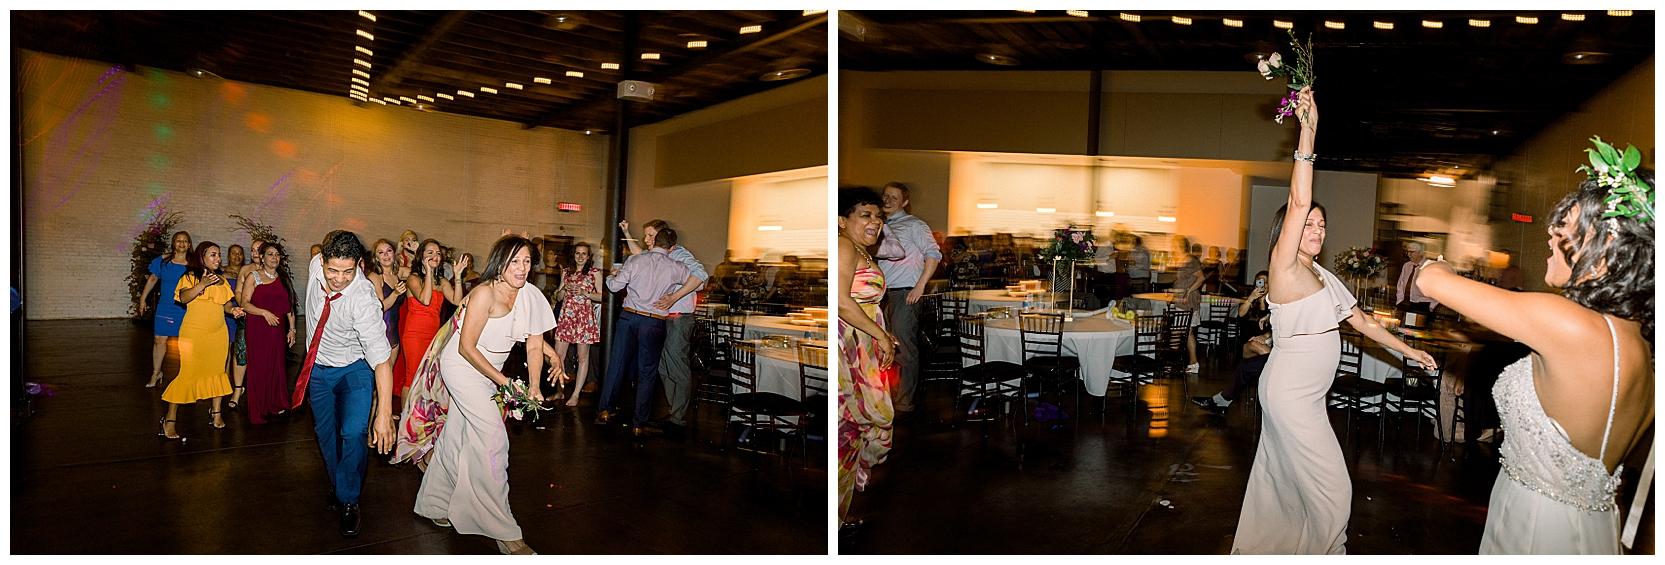 jessicafredericks_lakeland_tampa_wedding_purple_crazy hour_0107.jpg